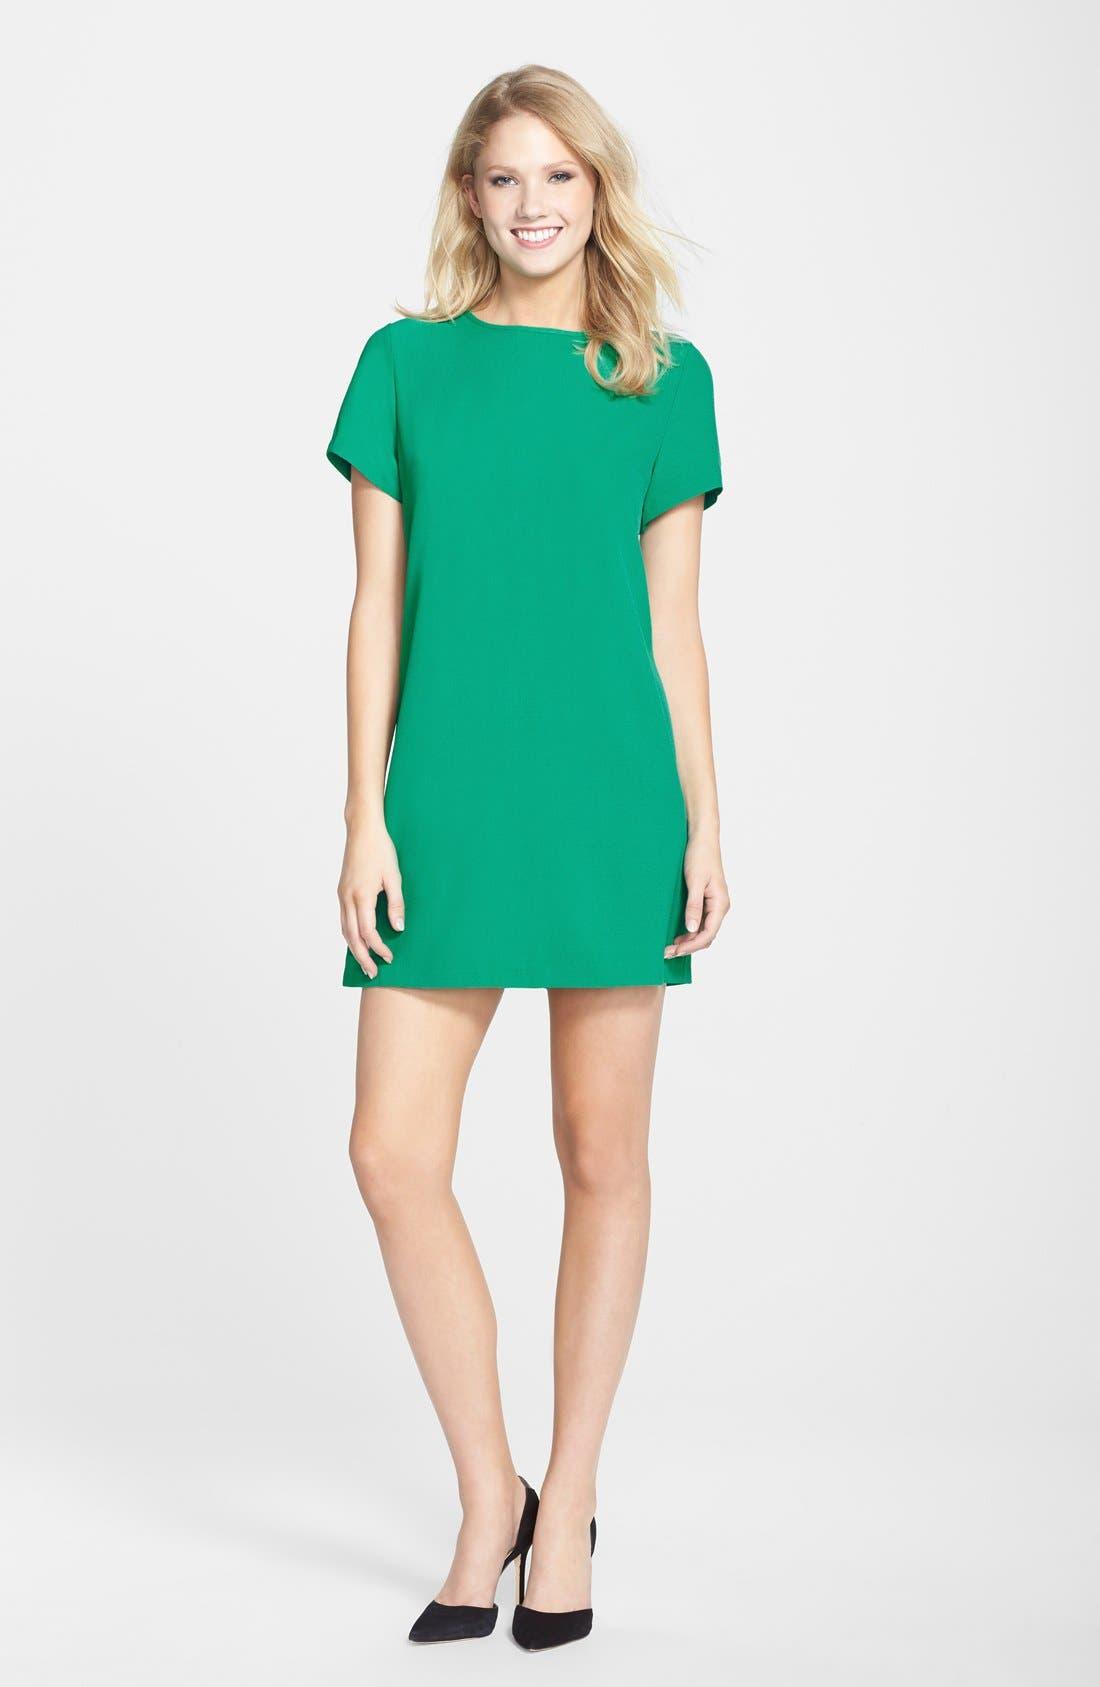 Devery Crepe Shift Dress,                             Alternate thumbnail 12, color,                             EMERALD GREEN